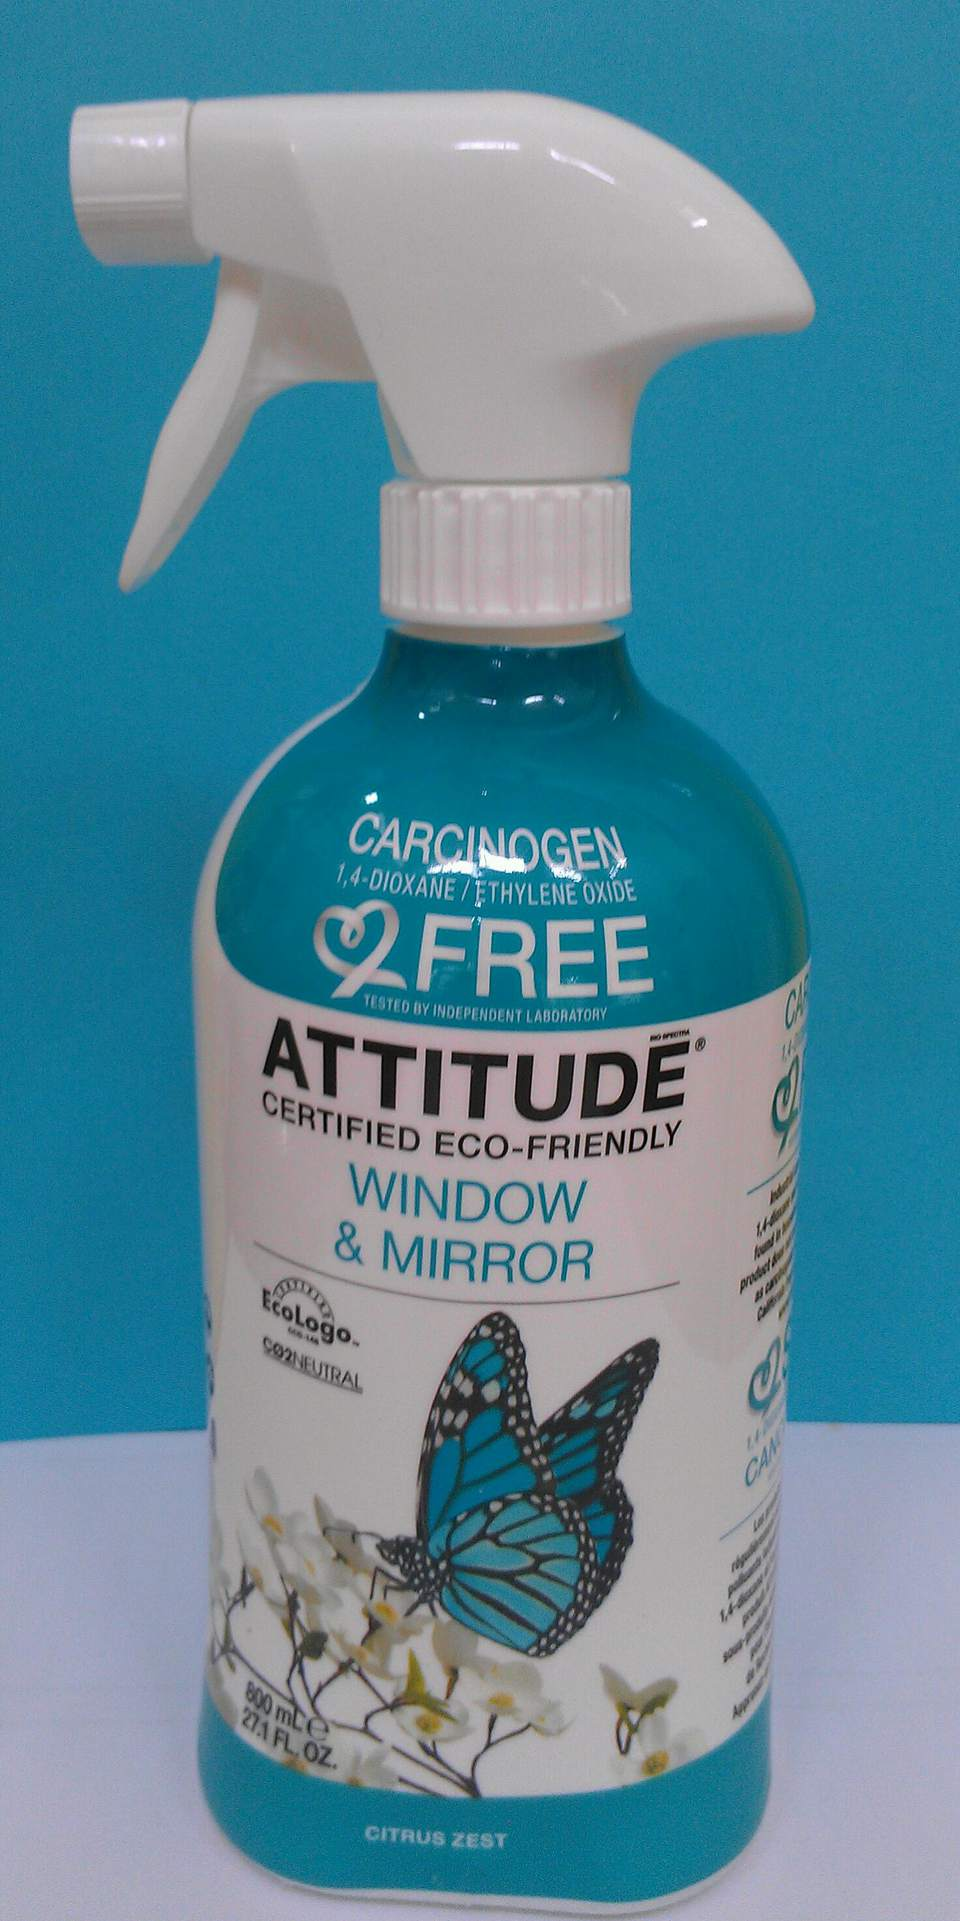 Attitude Window & Mirror Eco-Cleaner, Citrus Zest Scent